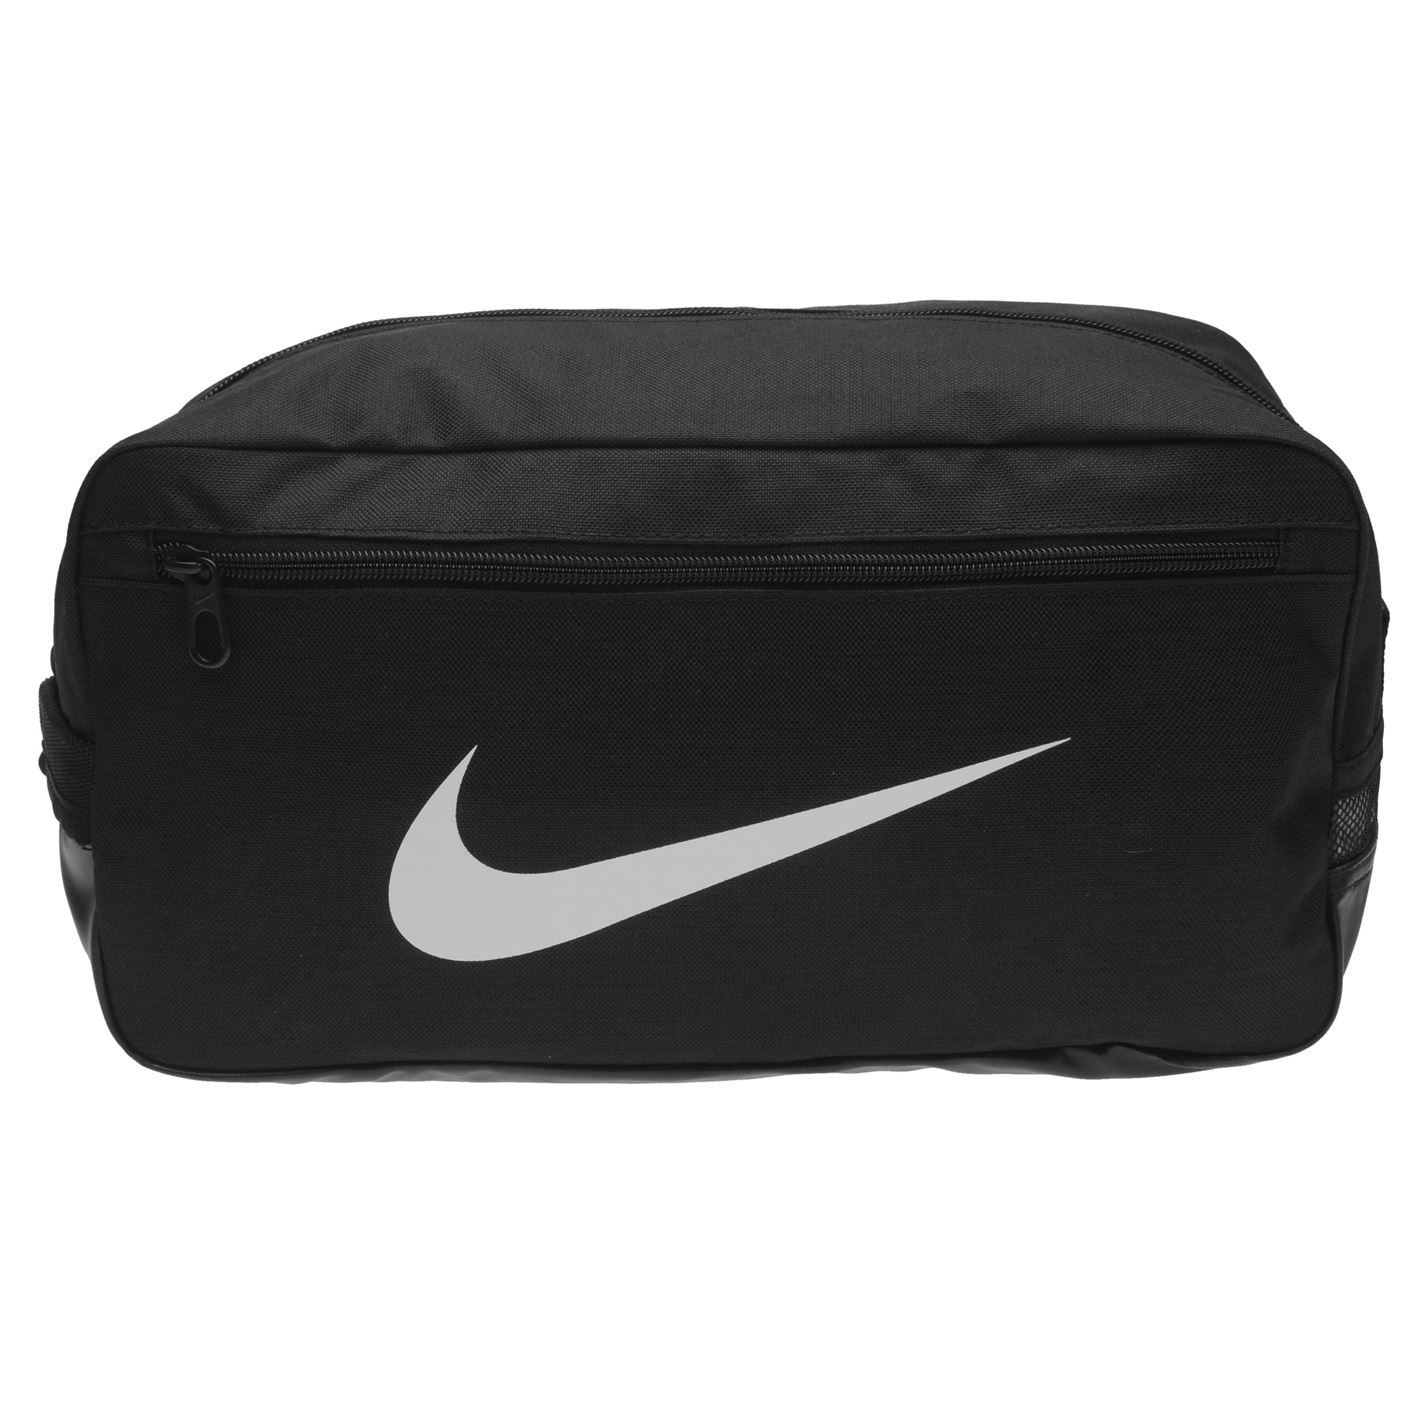 Sac Chaussures Chaussure Ebay Nike Noir Brasilia Sport qpfxE0